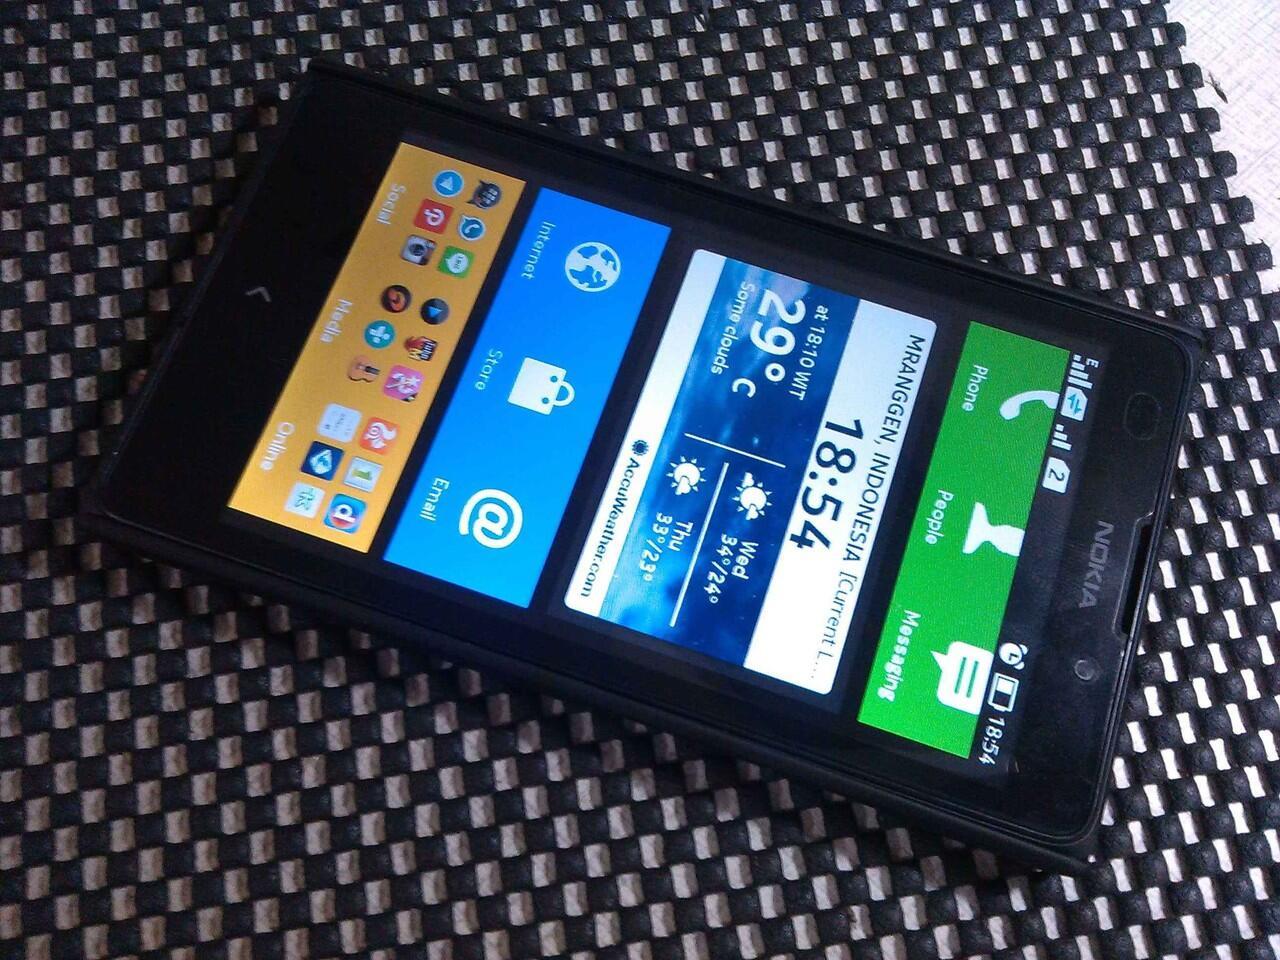 android nokia XL 5 inch dual black murah garansi juni 2015 semarang